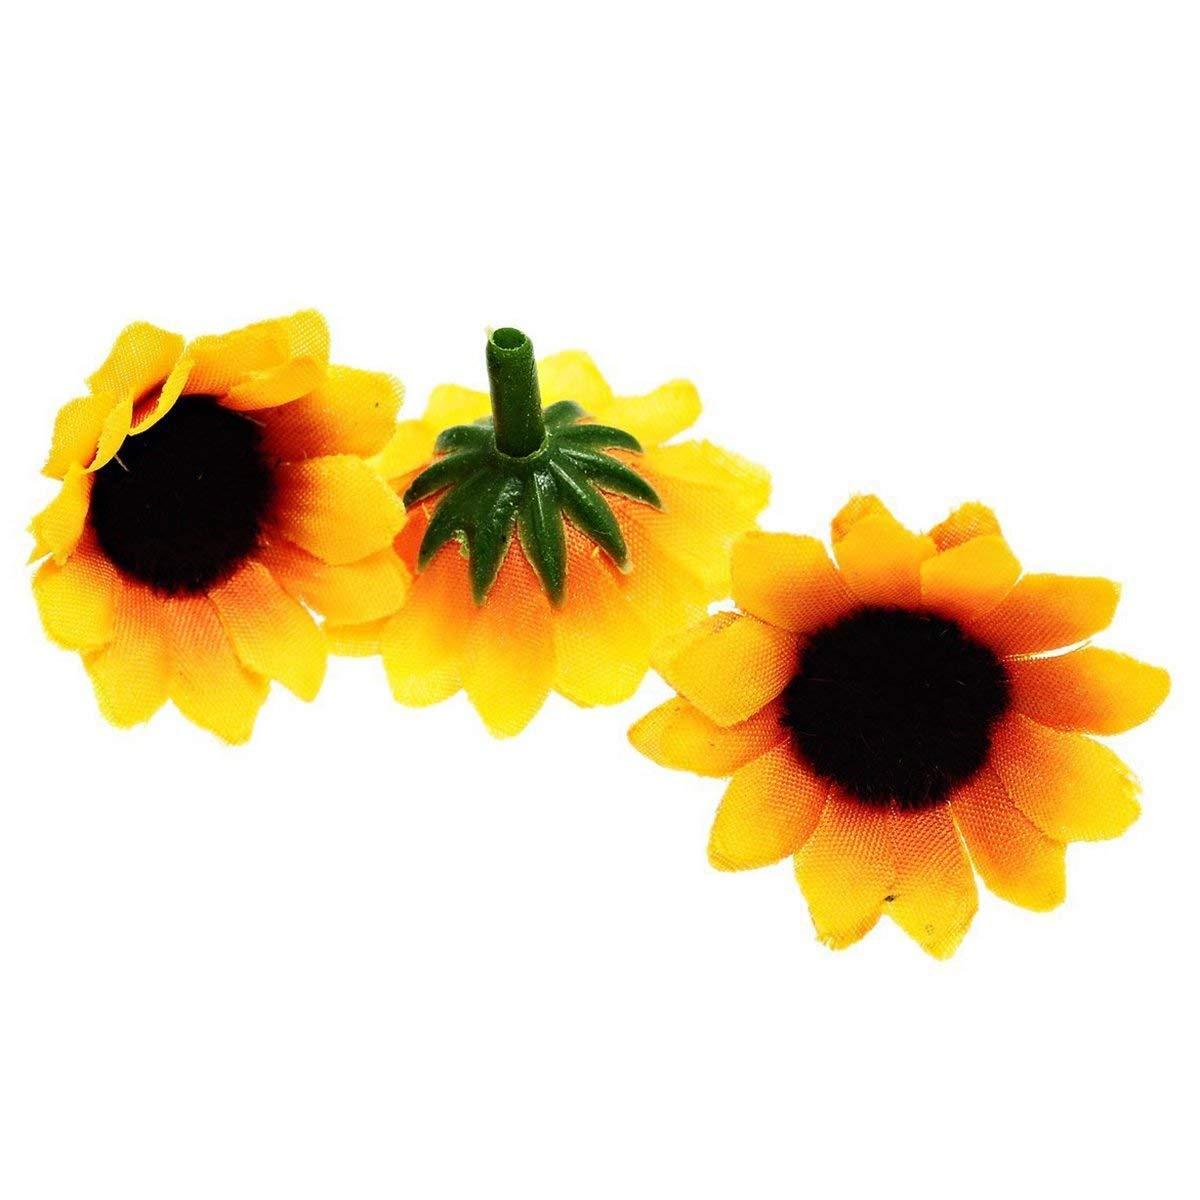 SODIAL(R) 100 Pcs Artificial Sunflower Little Daisy Gerbera Flower Heads for Wedding Party Decor (Yellow&Coffee)